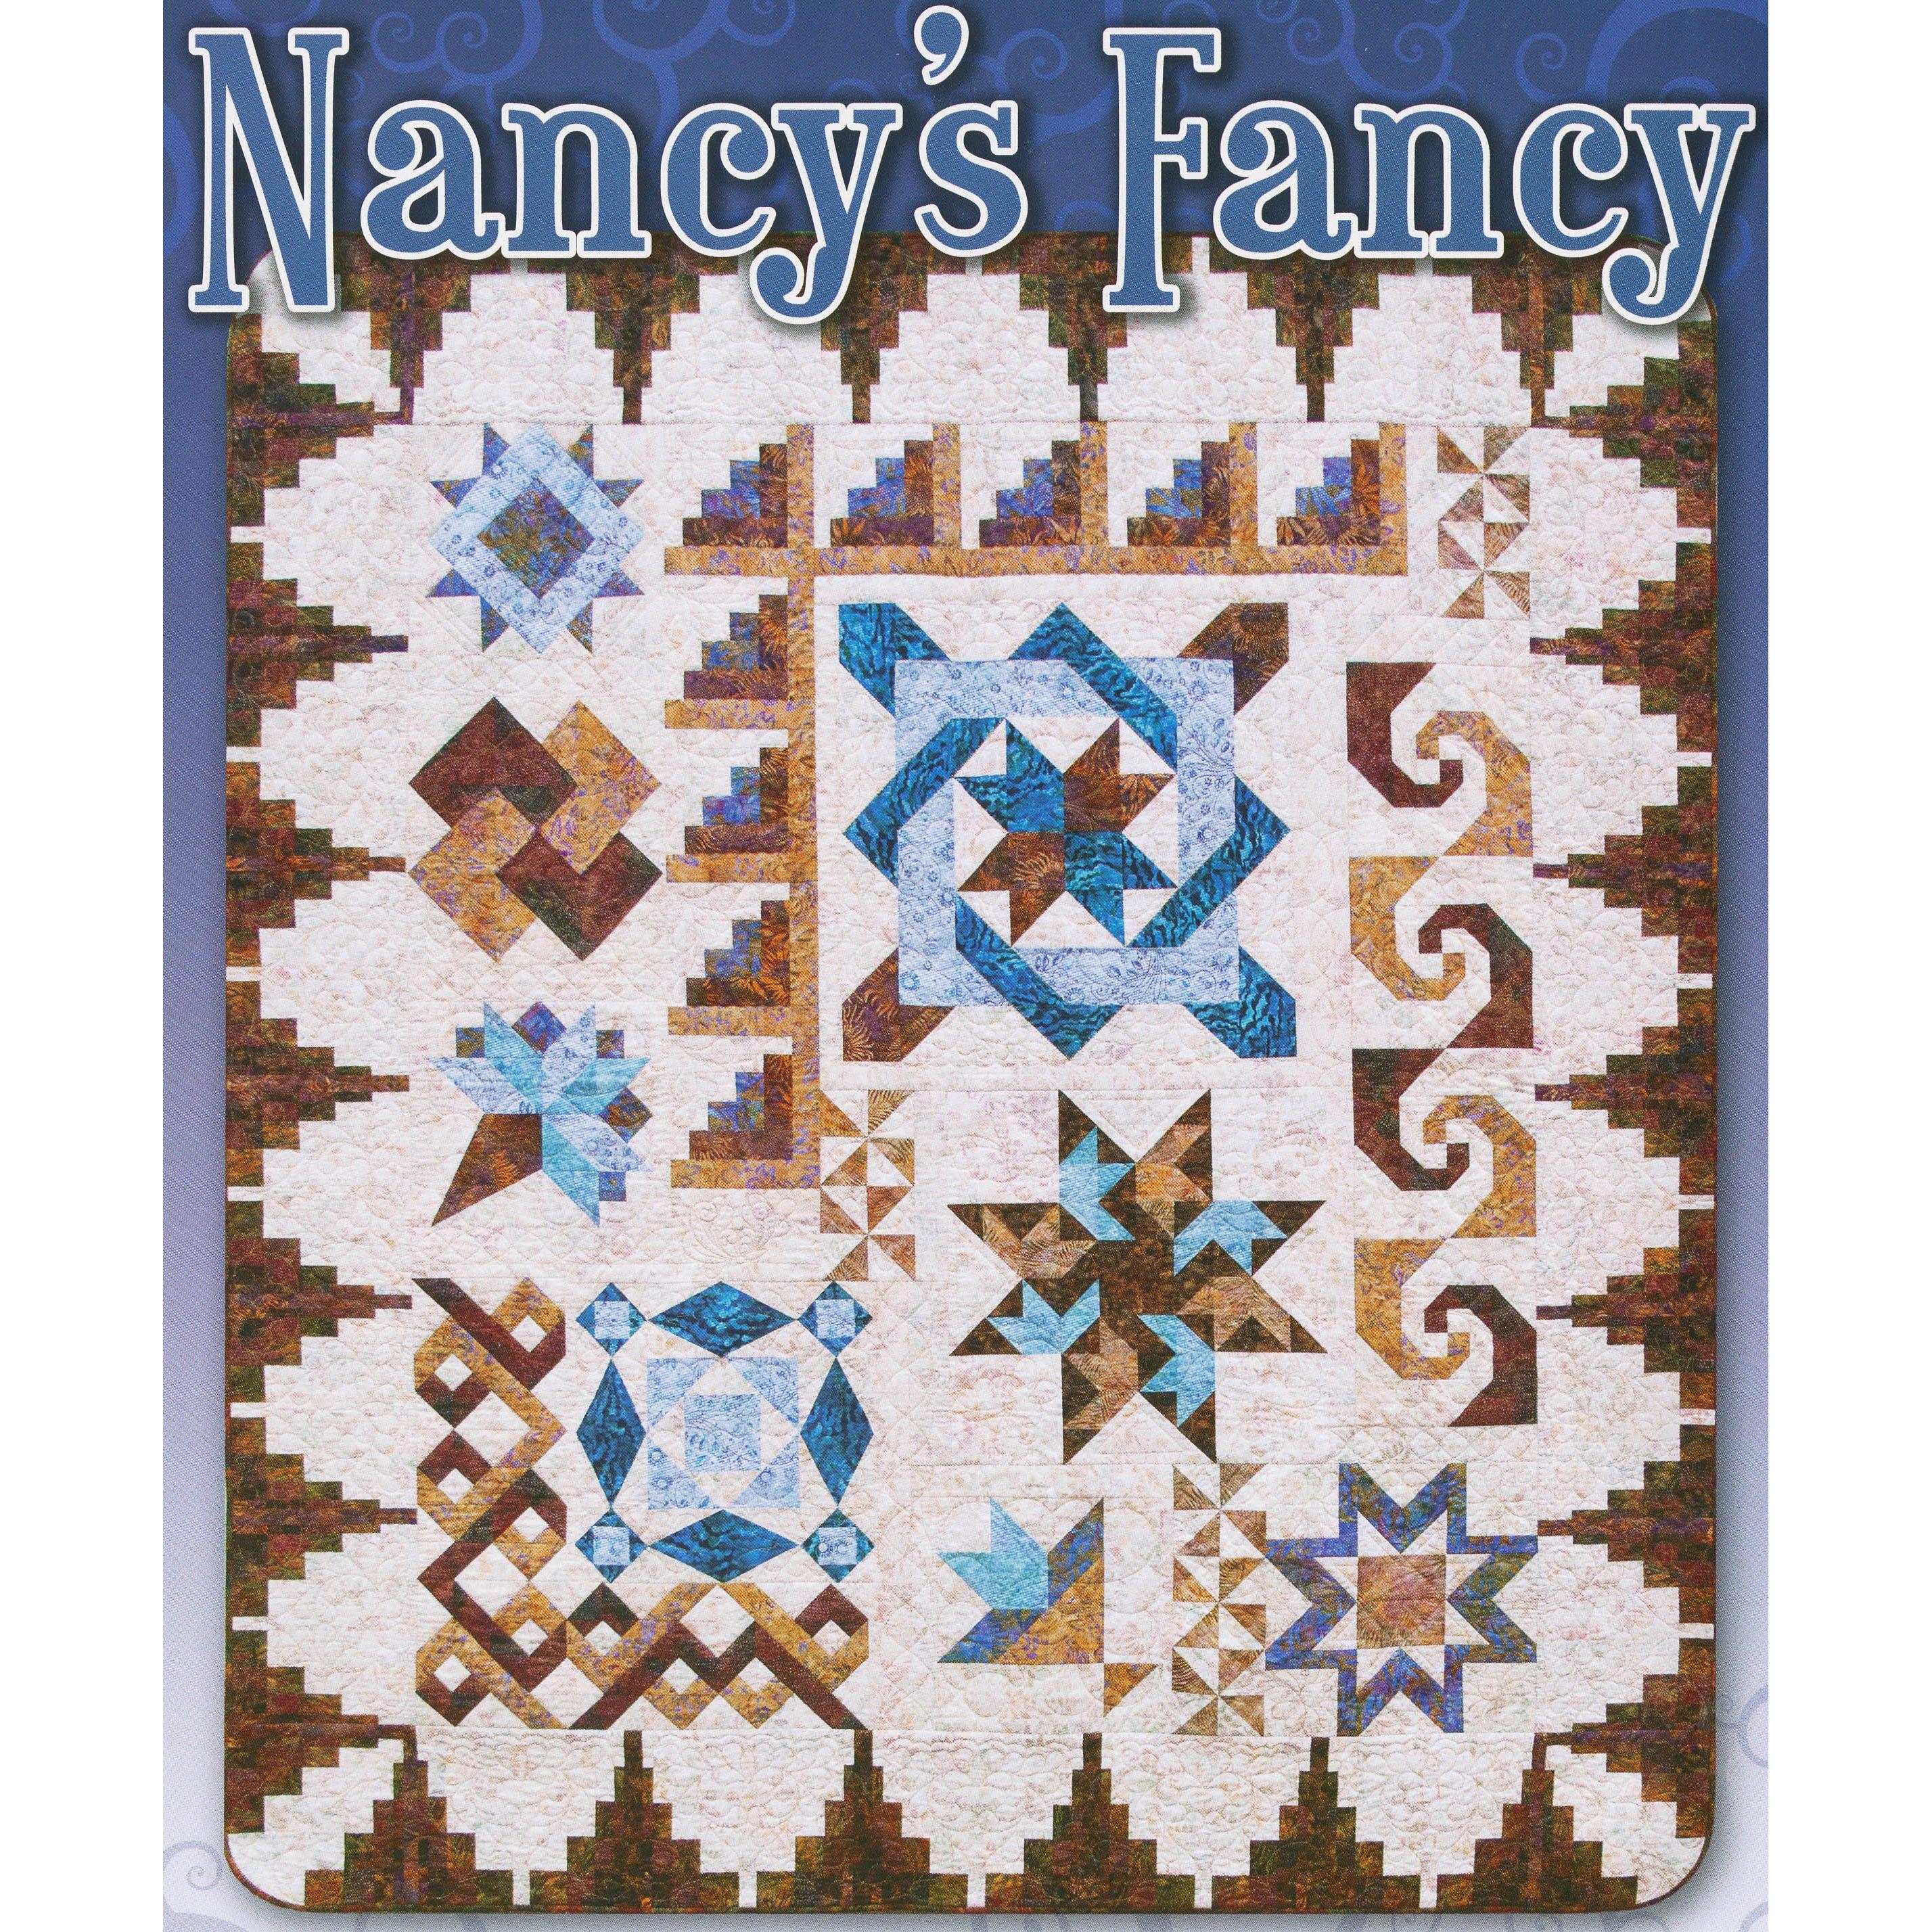 Nancy's Fancy Quilt